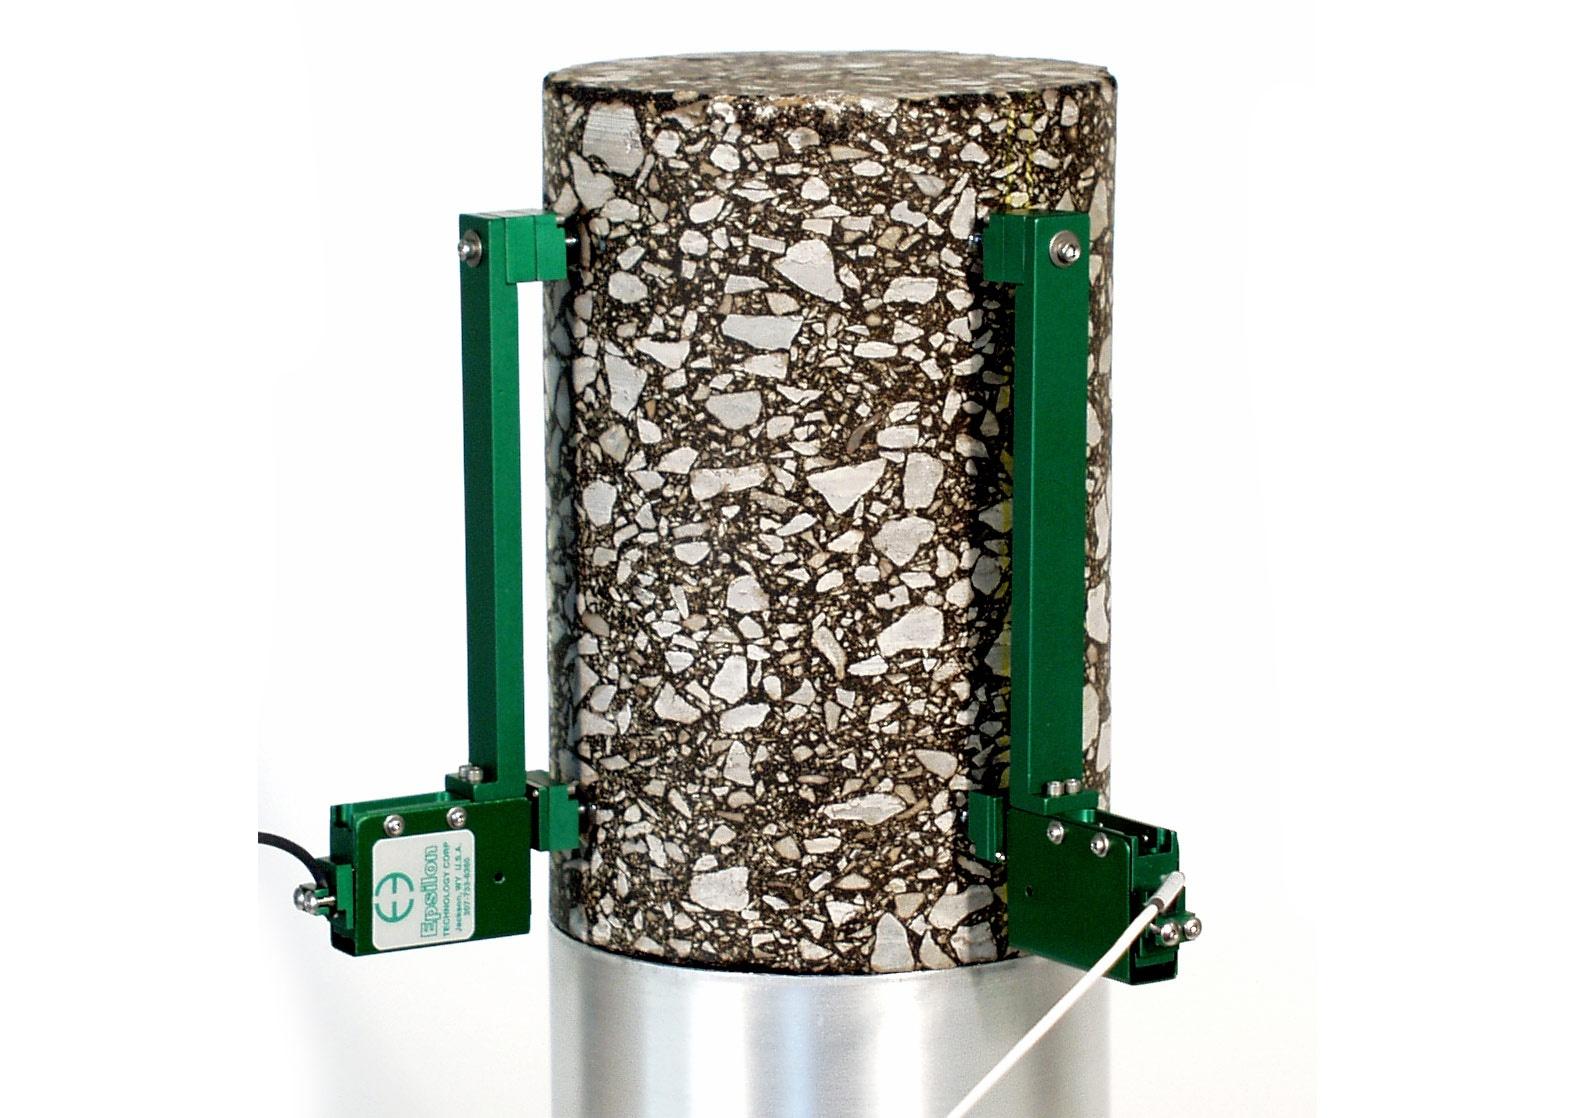 Epsilon MODEL 3909 Extensometers for Simple Performance Testing of Asphalt